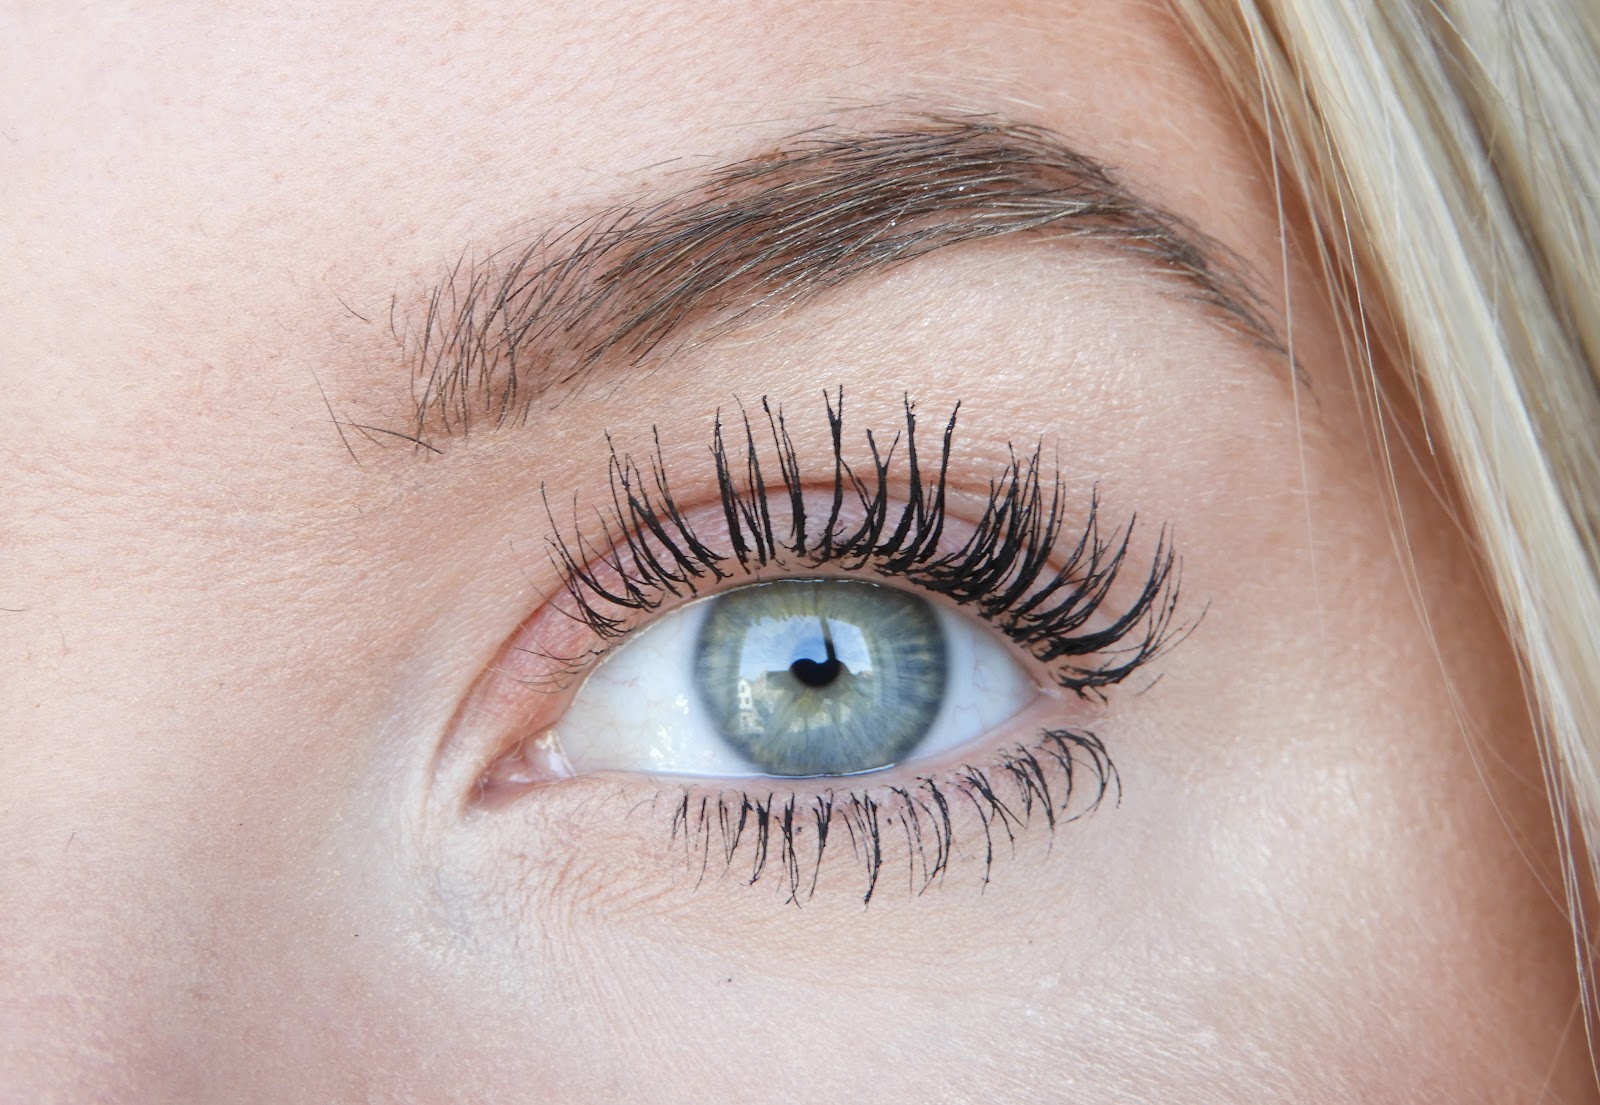 Catrice Eyeconista Mascara Review Waterproof Irispraatnl